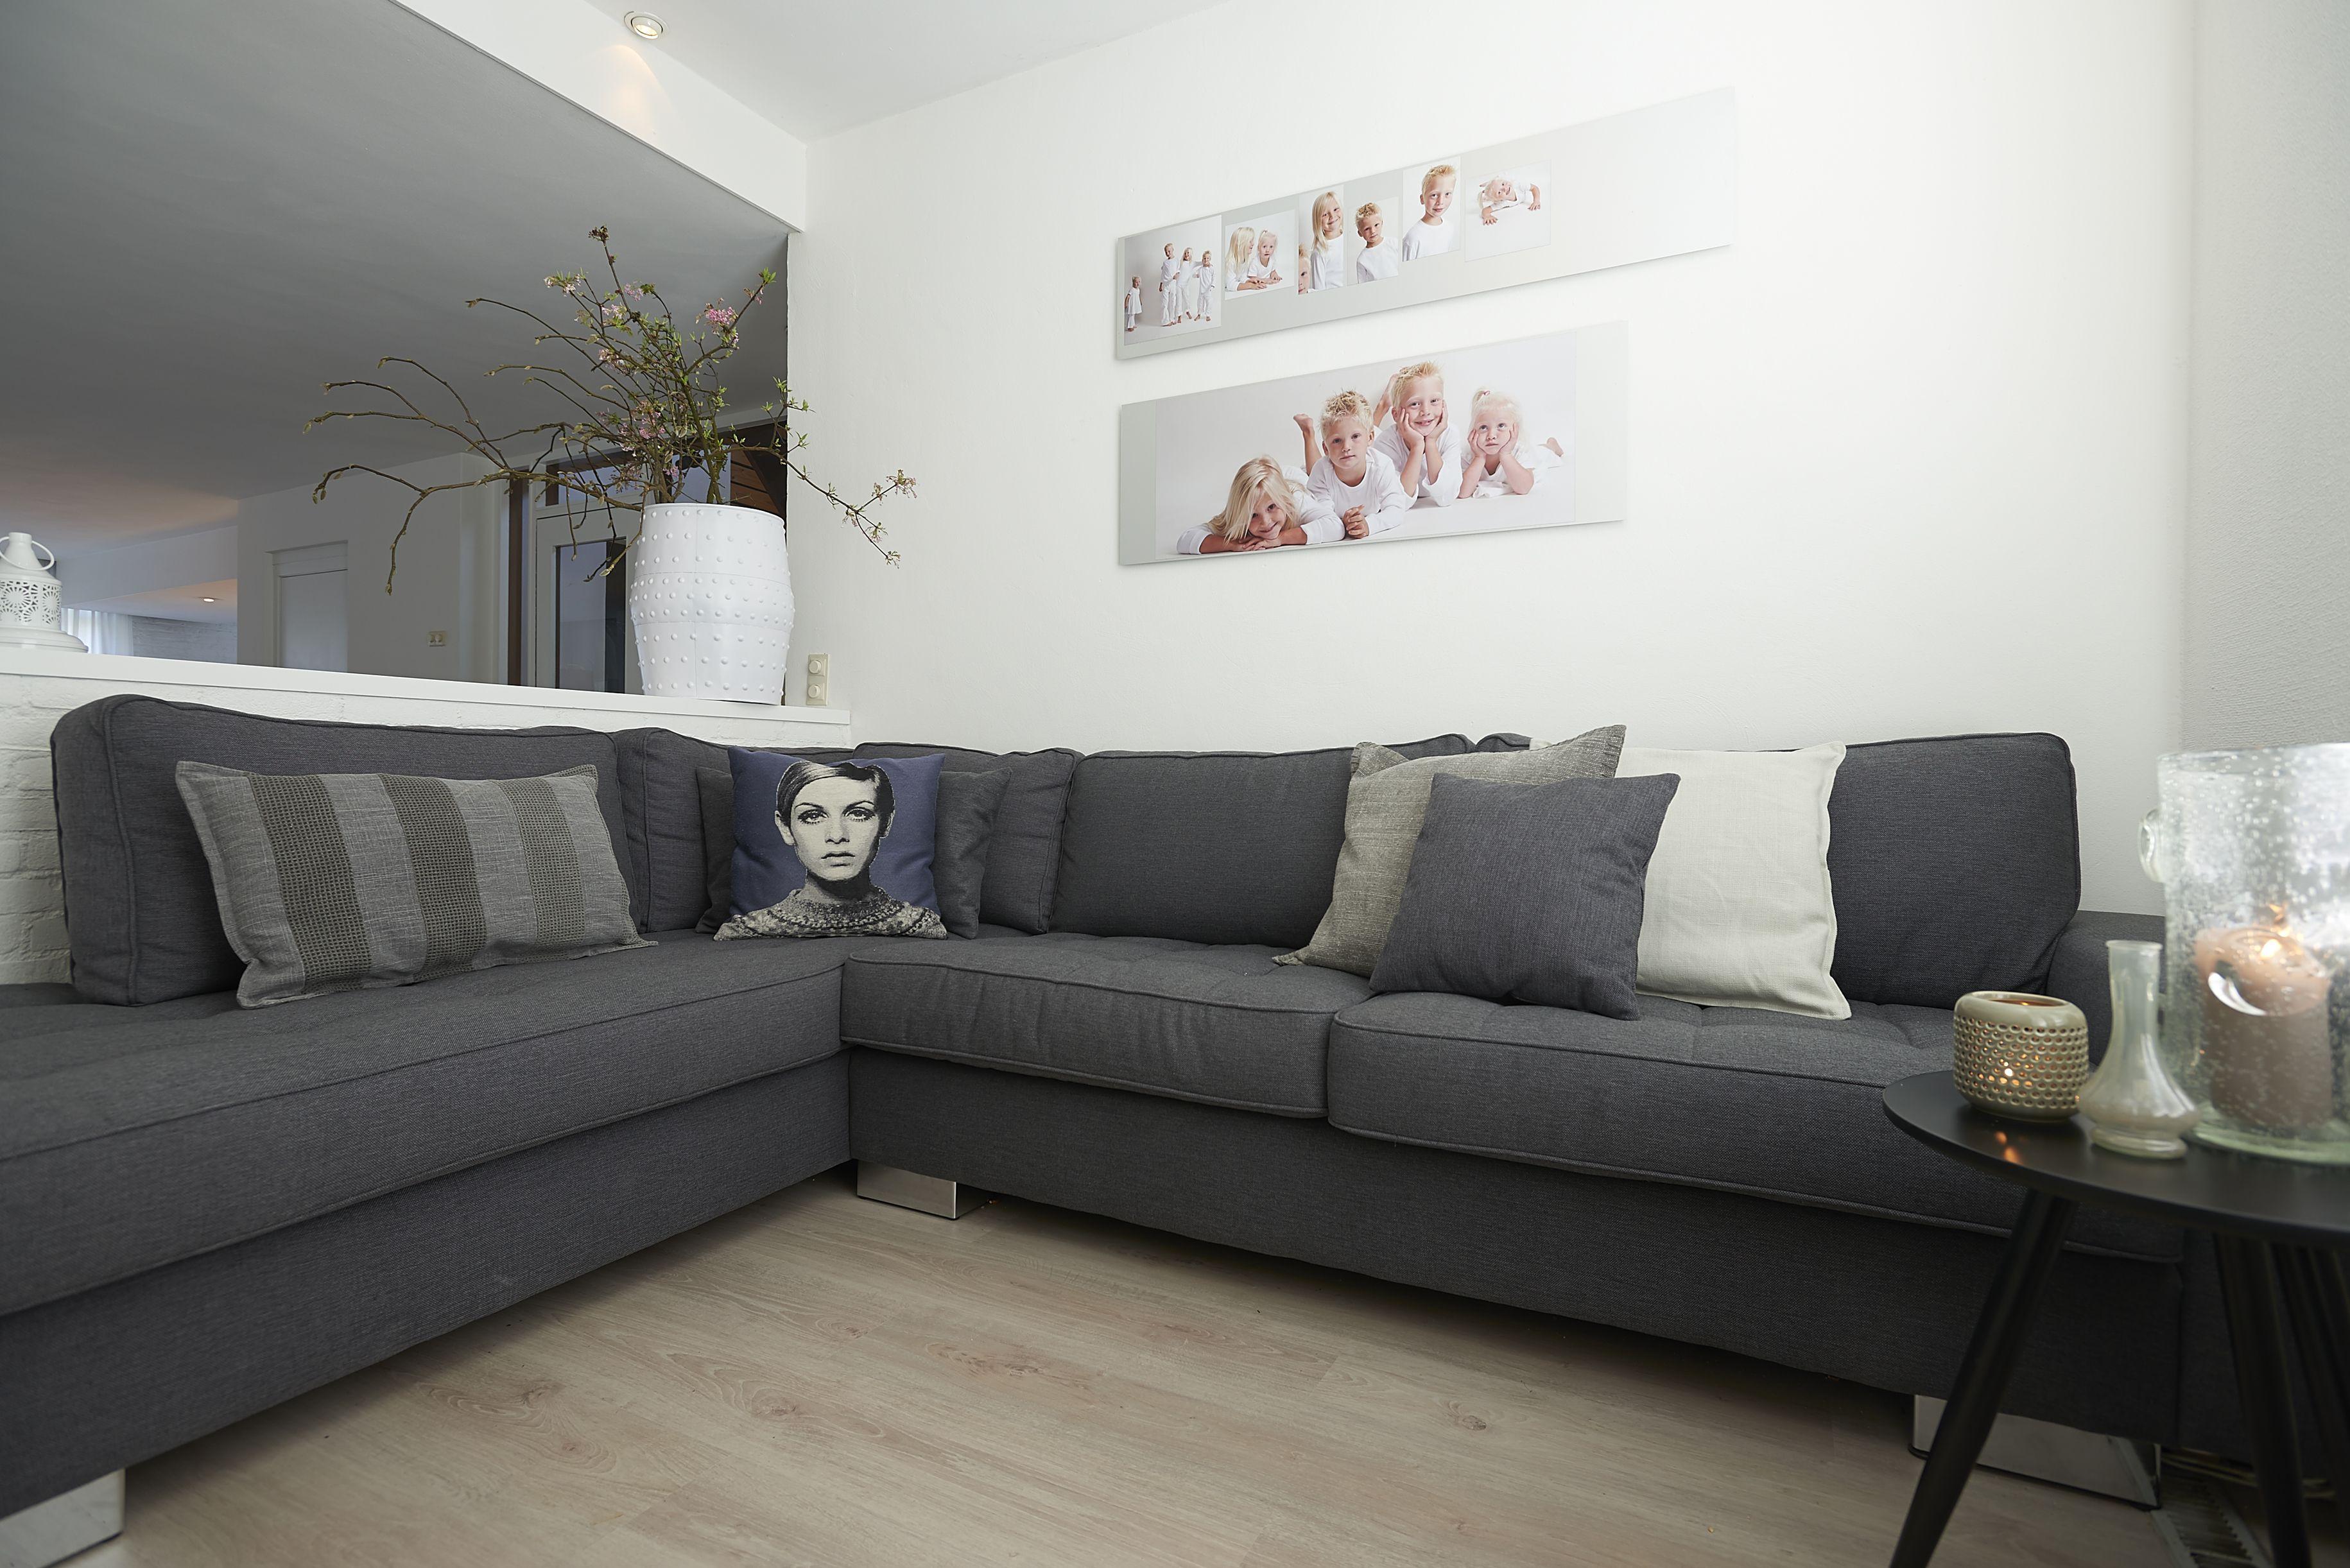 Hoekbank Montel Cima.Hoekbank Cima Plus Montel Banken Sofa Couch En Furniture